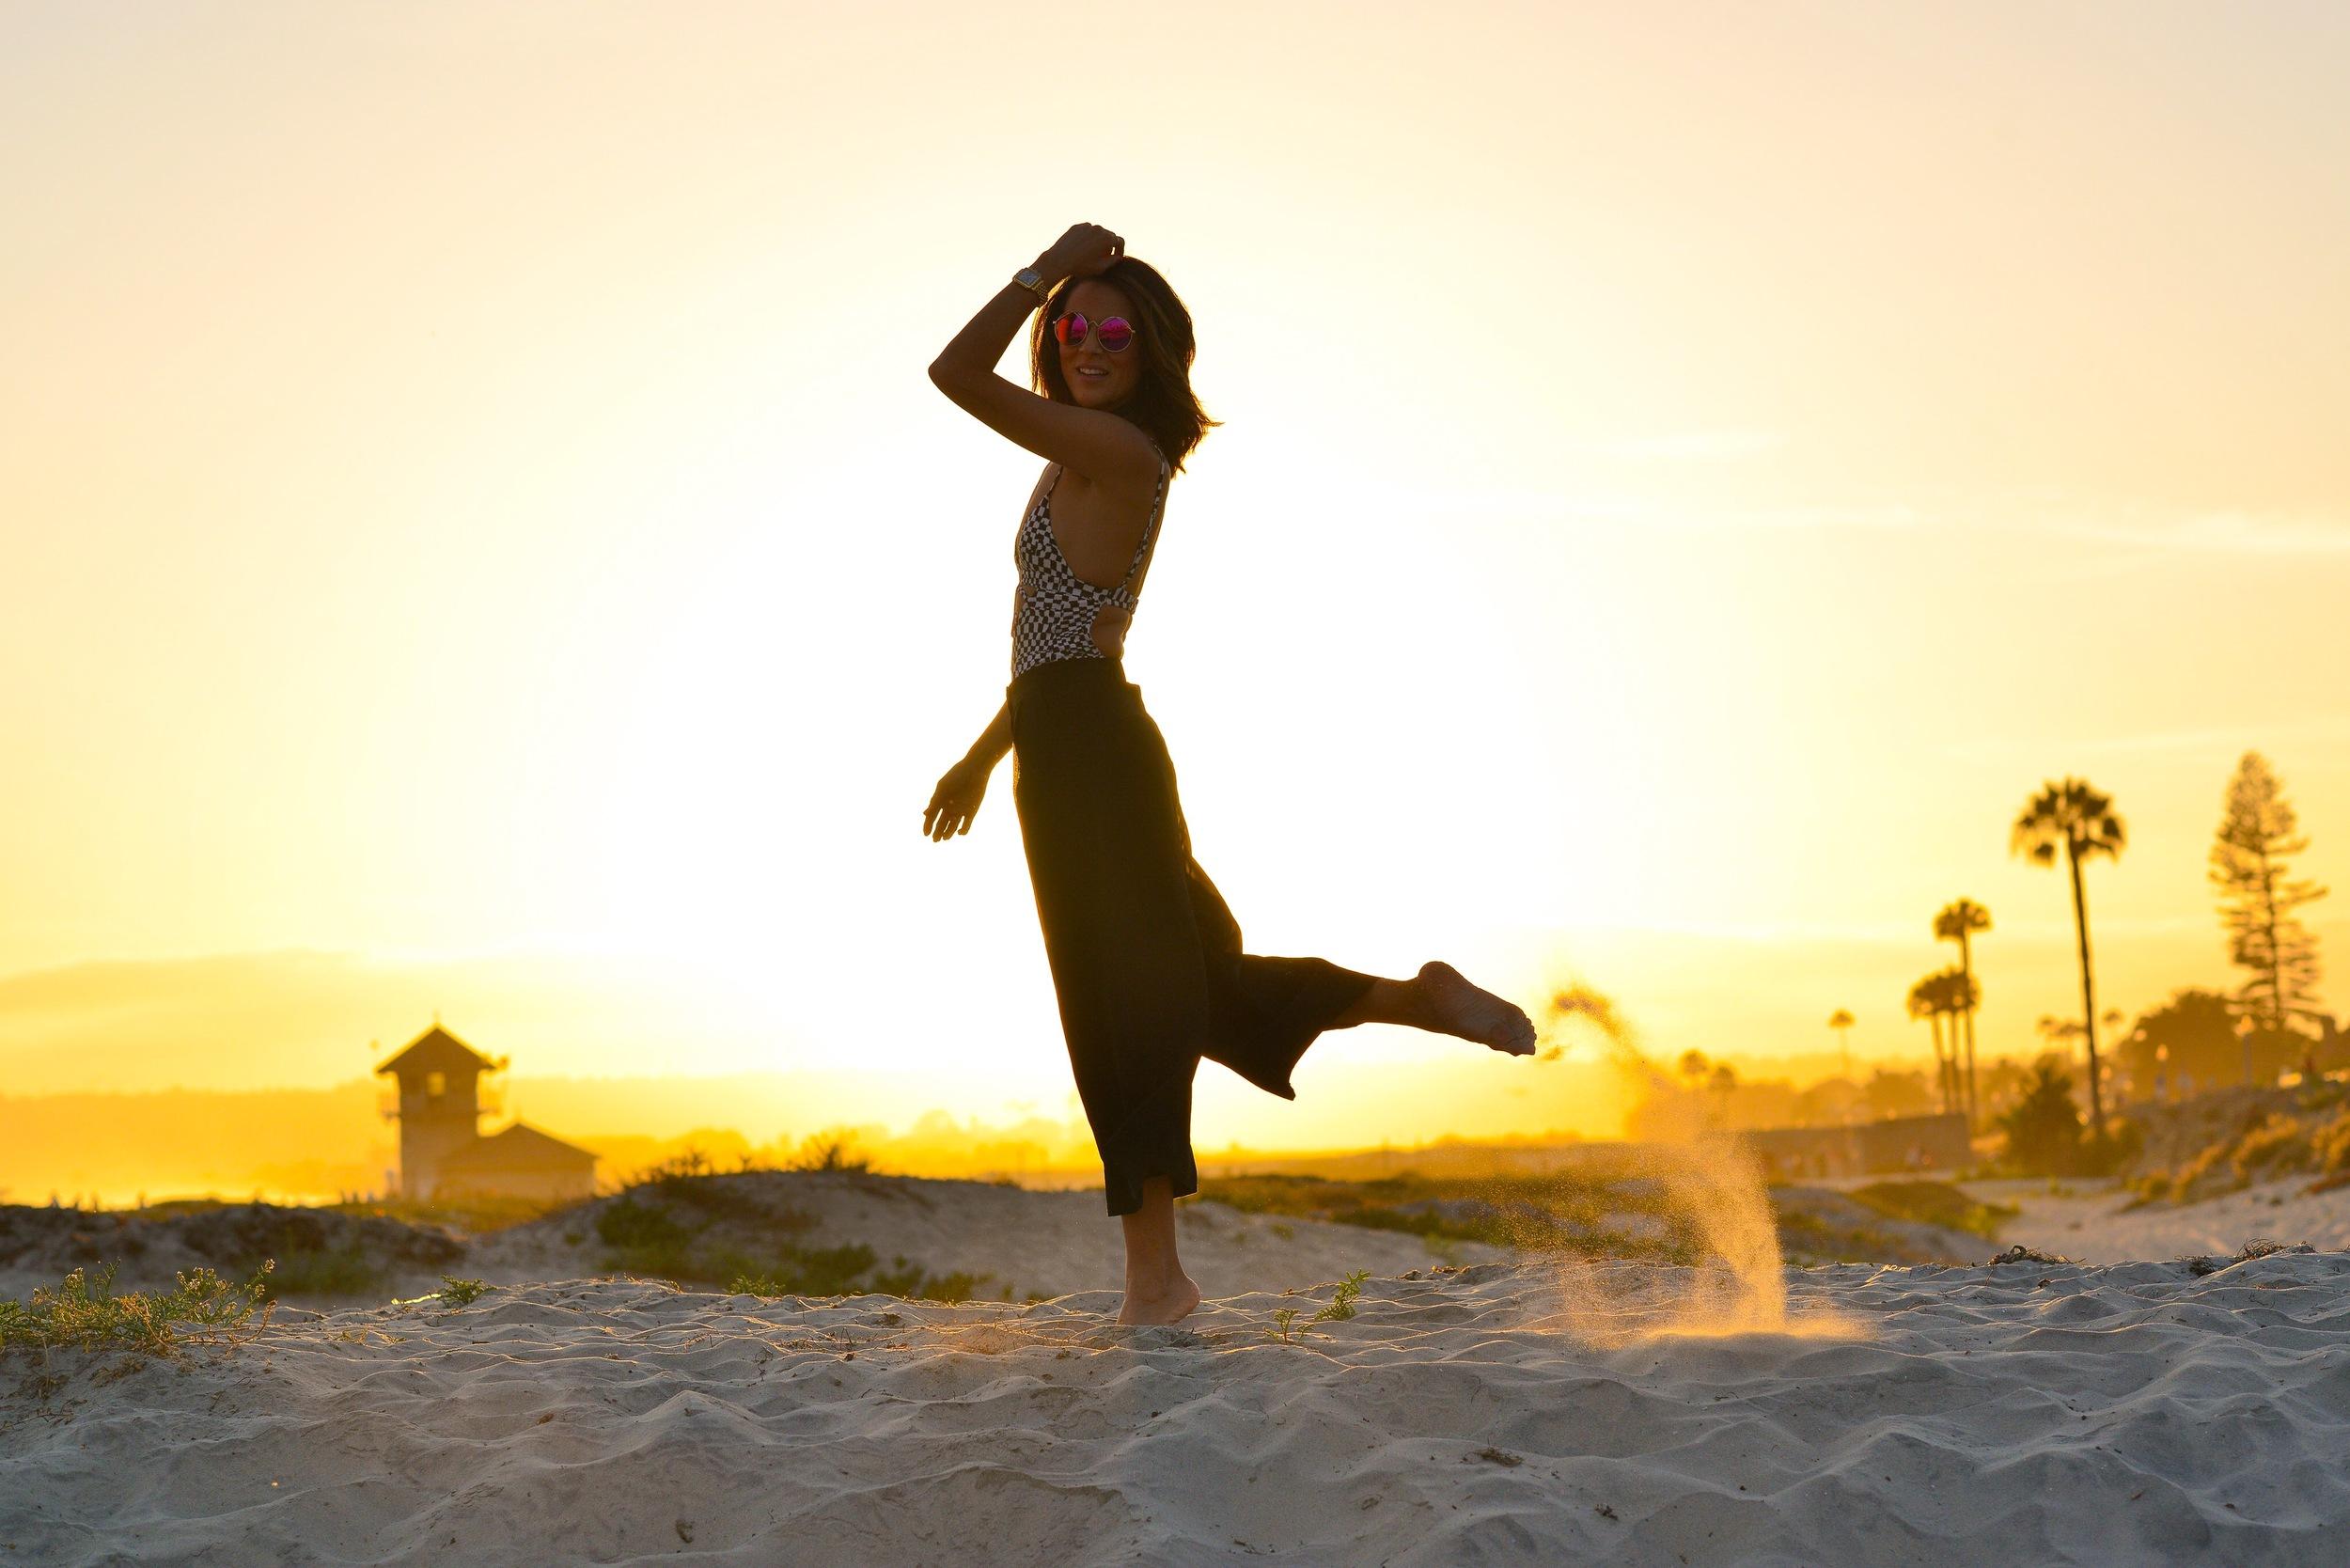 SummerNights_Sunset_SanDiego_MaraHoffman.jpg